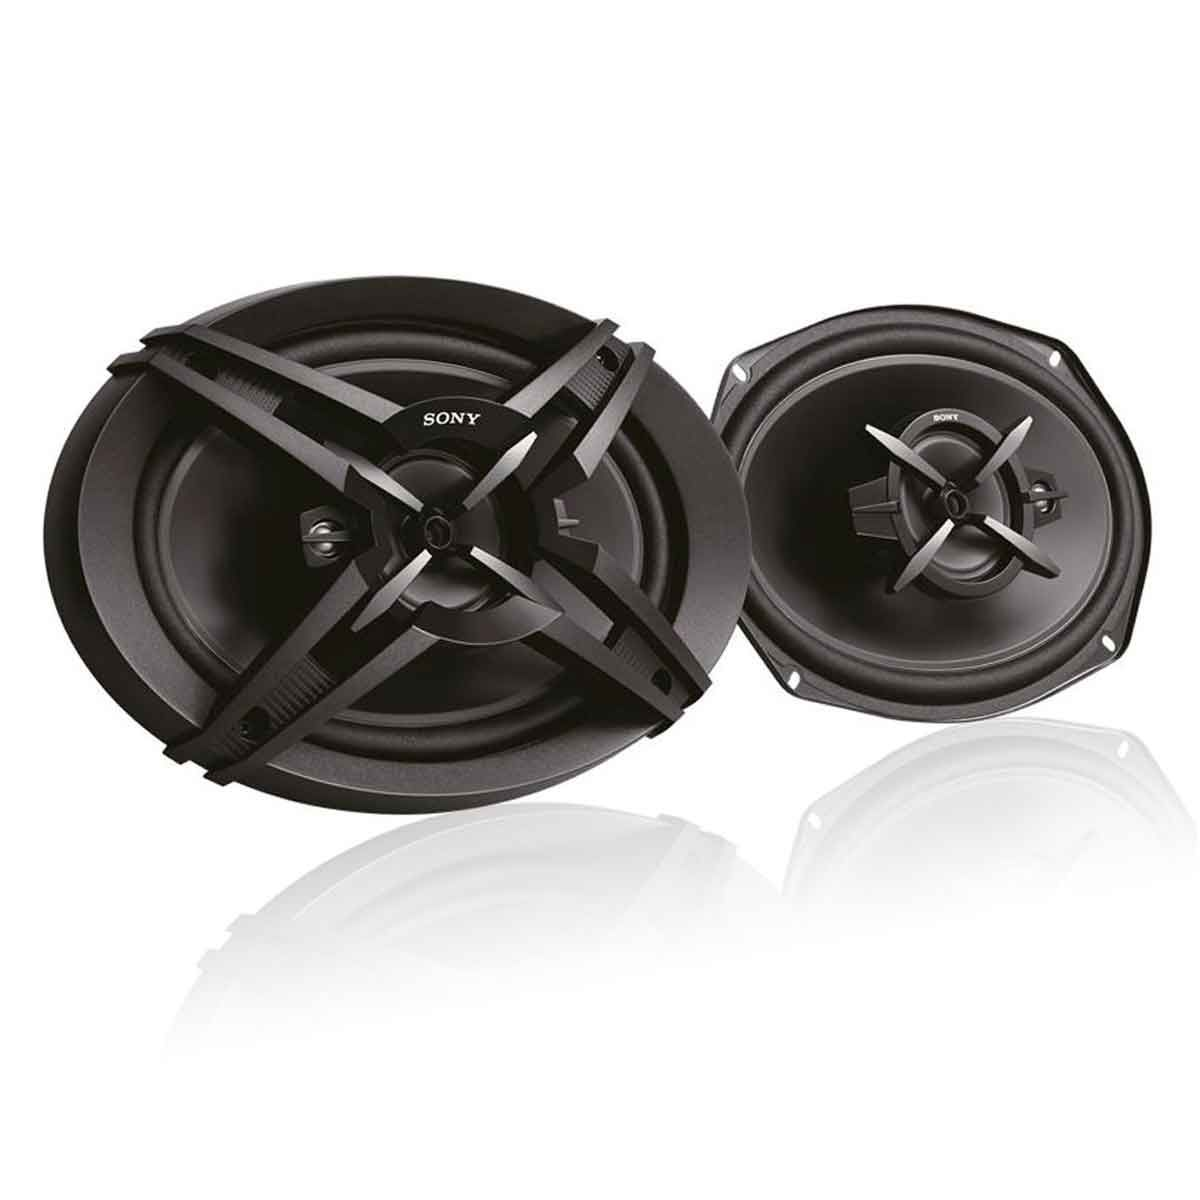 Sony Car Speakers (XS-FB693E)